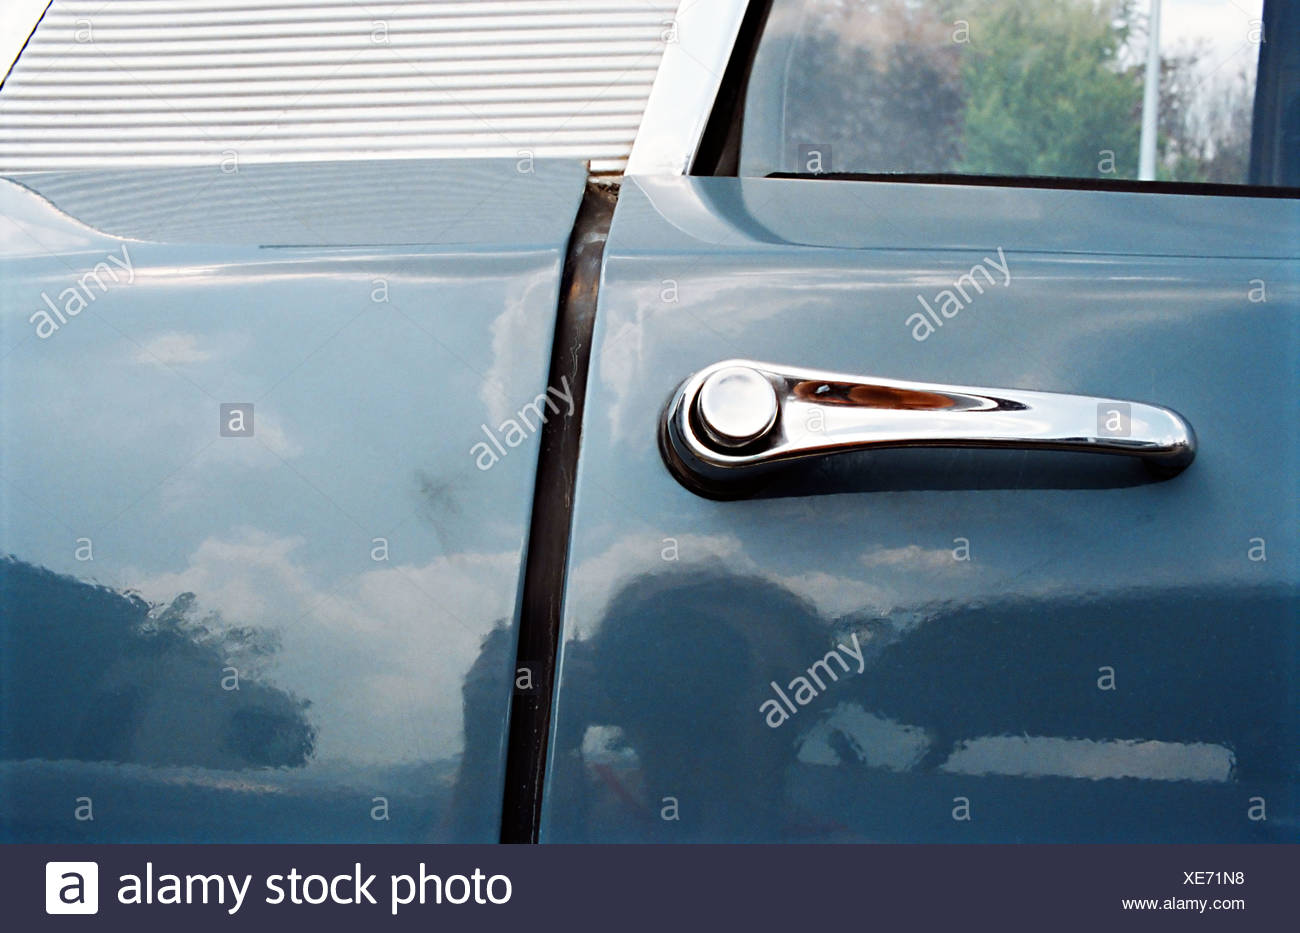 Close-up of vintage car door handle - Stock Image